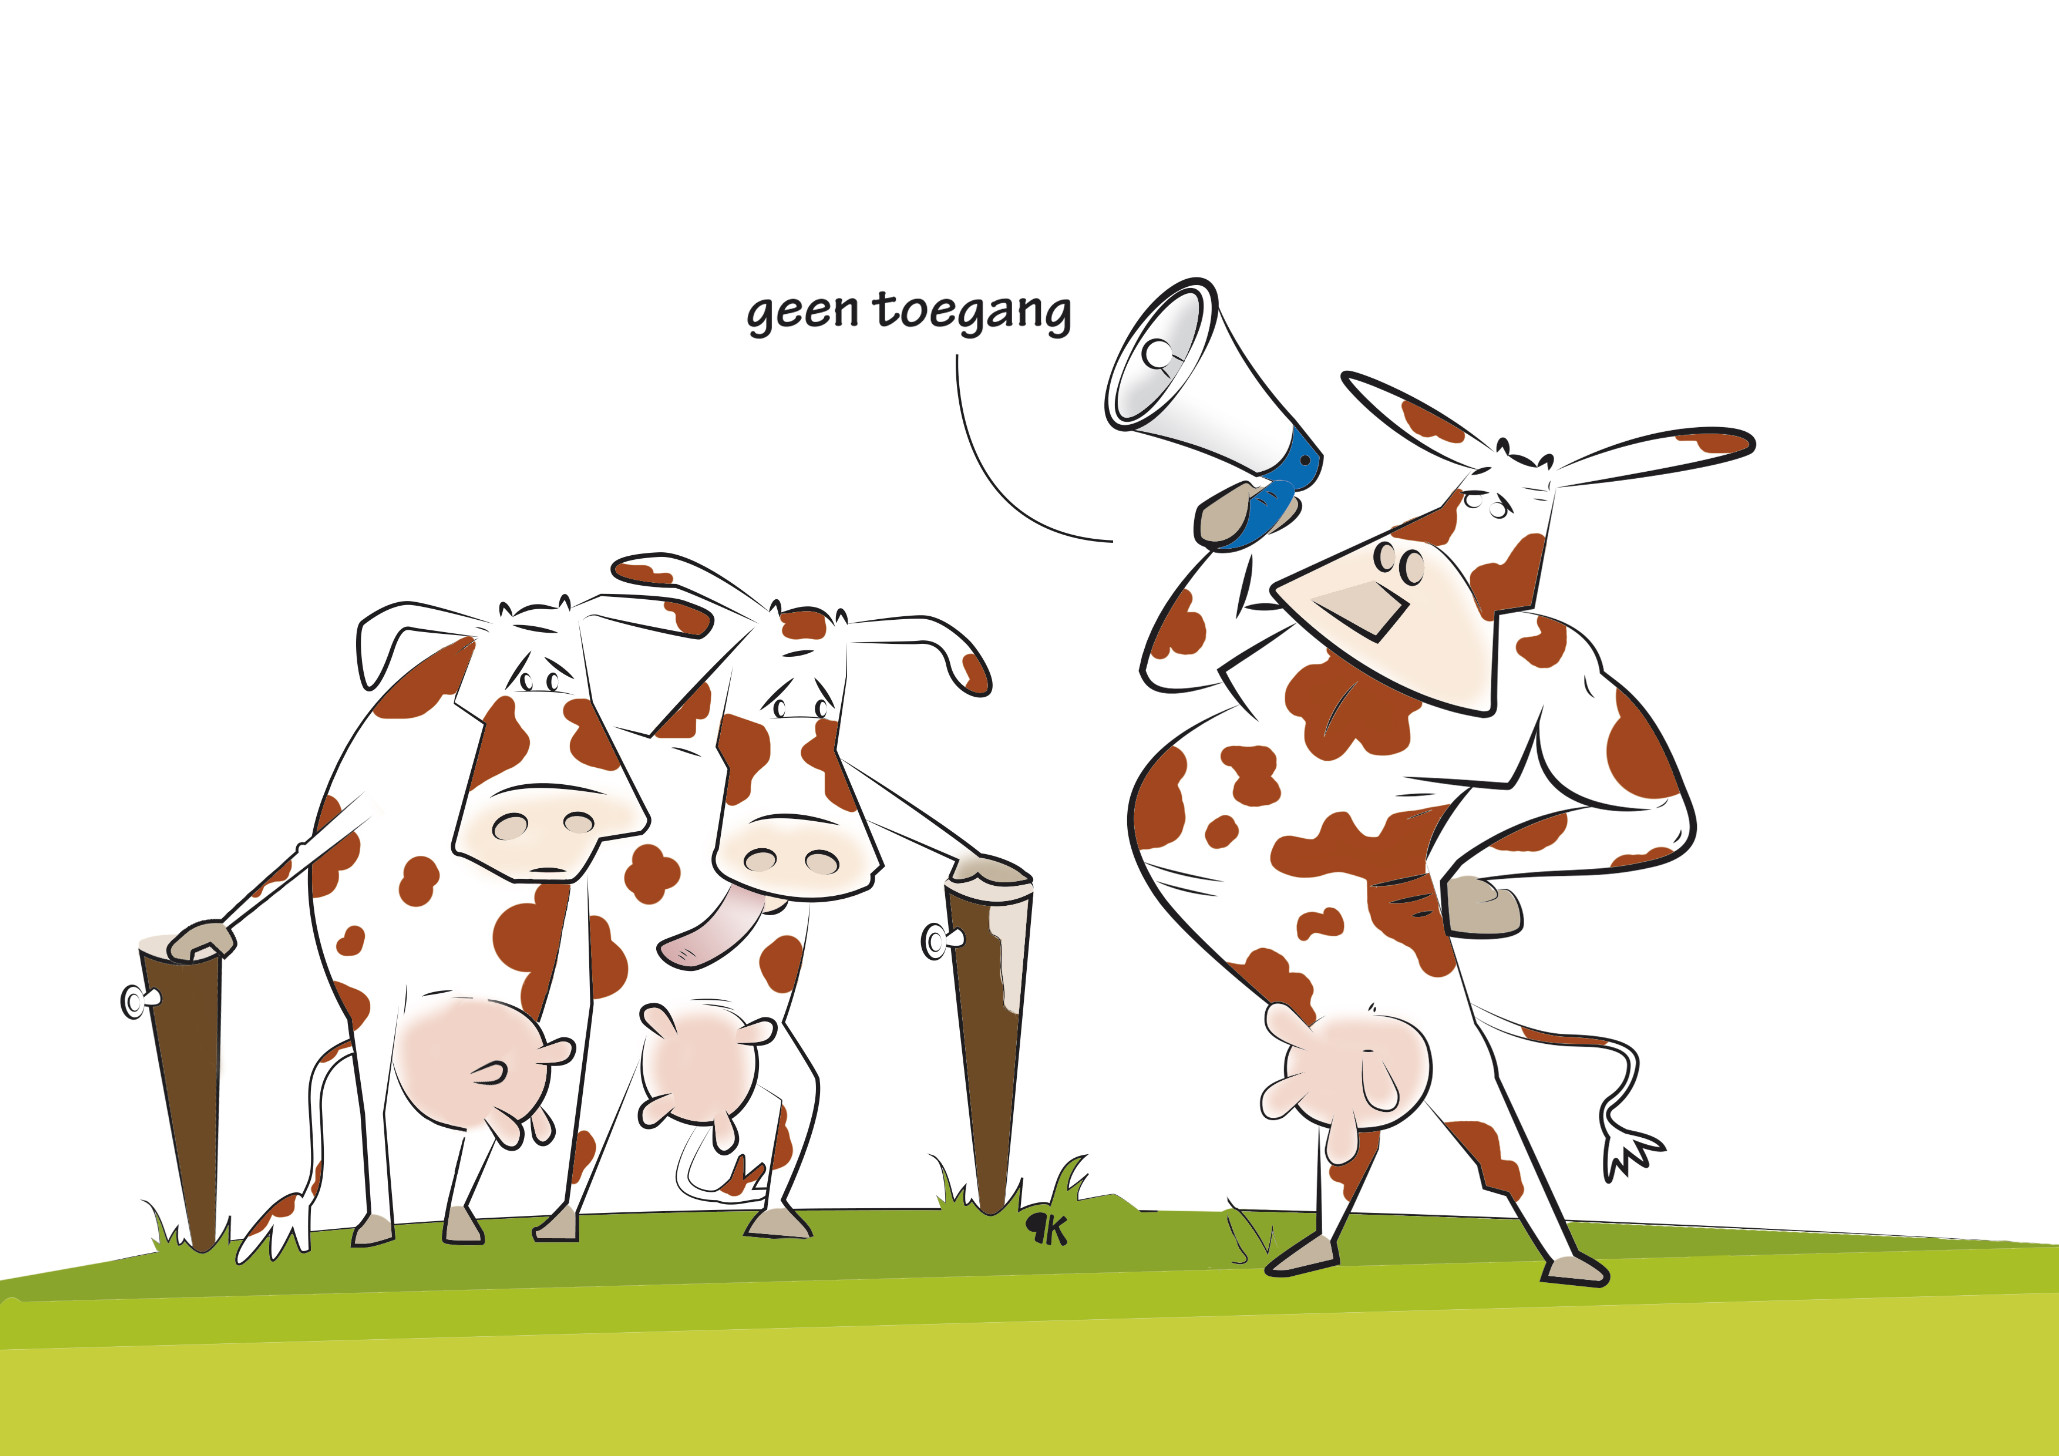 Beste boerenveestapel voor gebroeders Hoorn